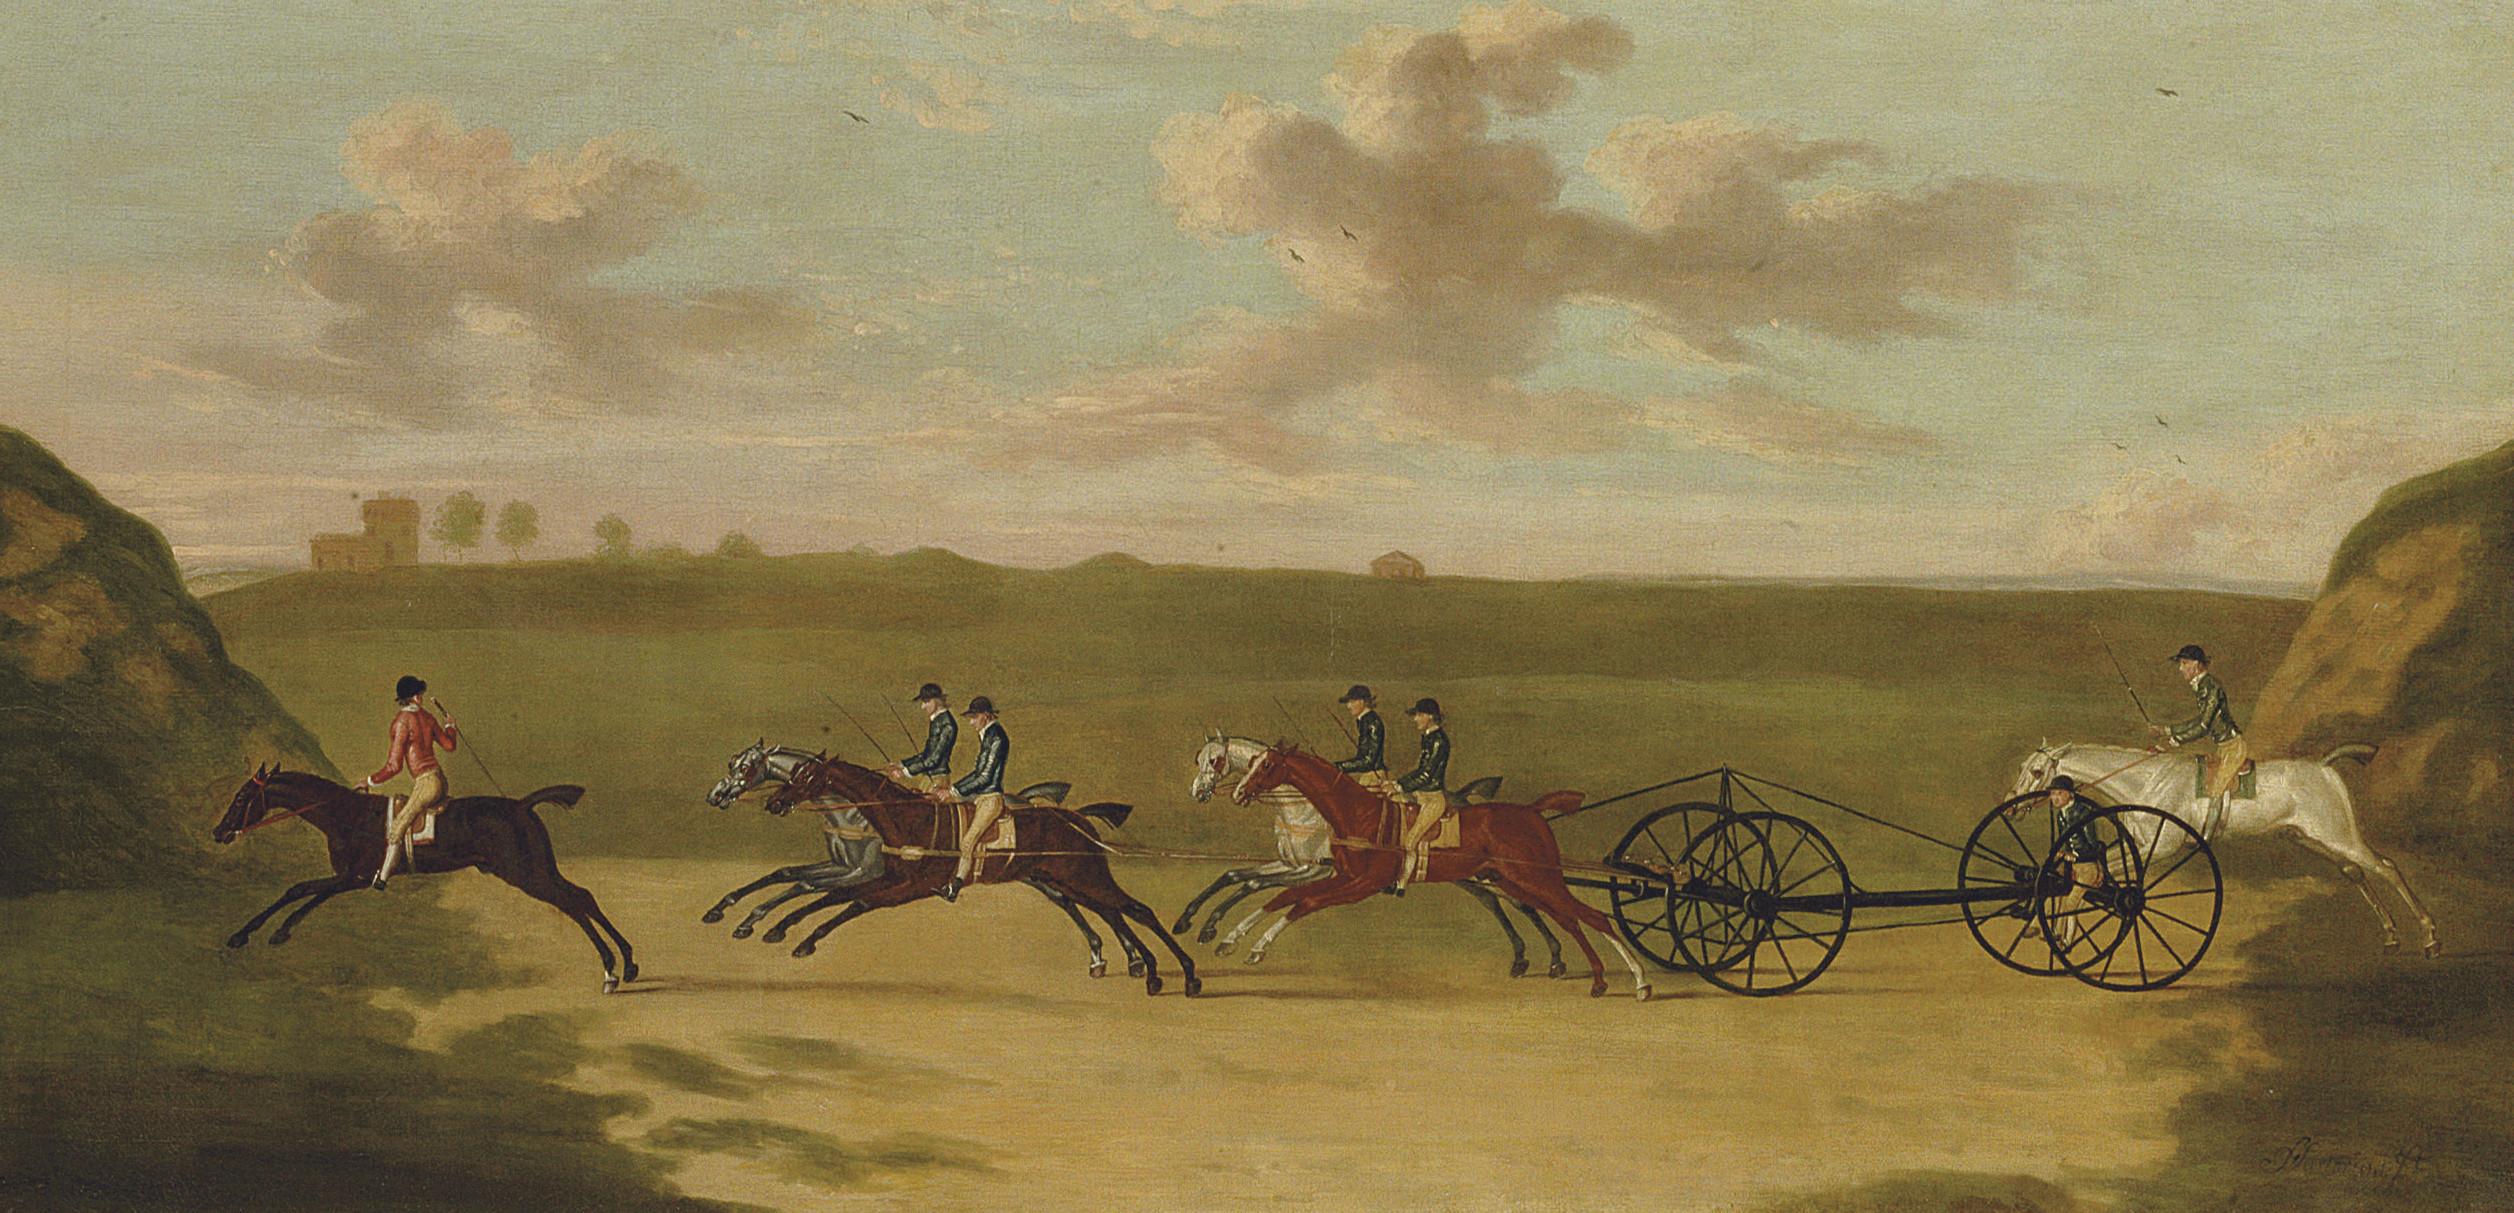 The chaise match, run on Newmarket Heath, Wednesday 29 August, 1750